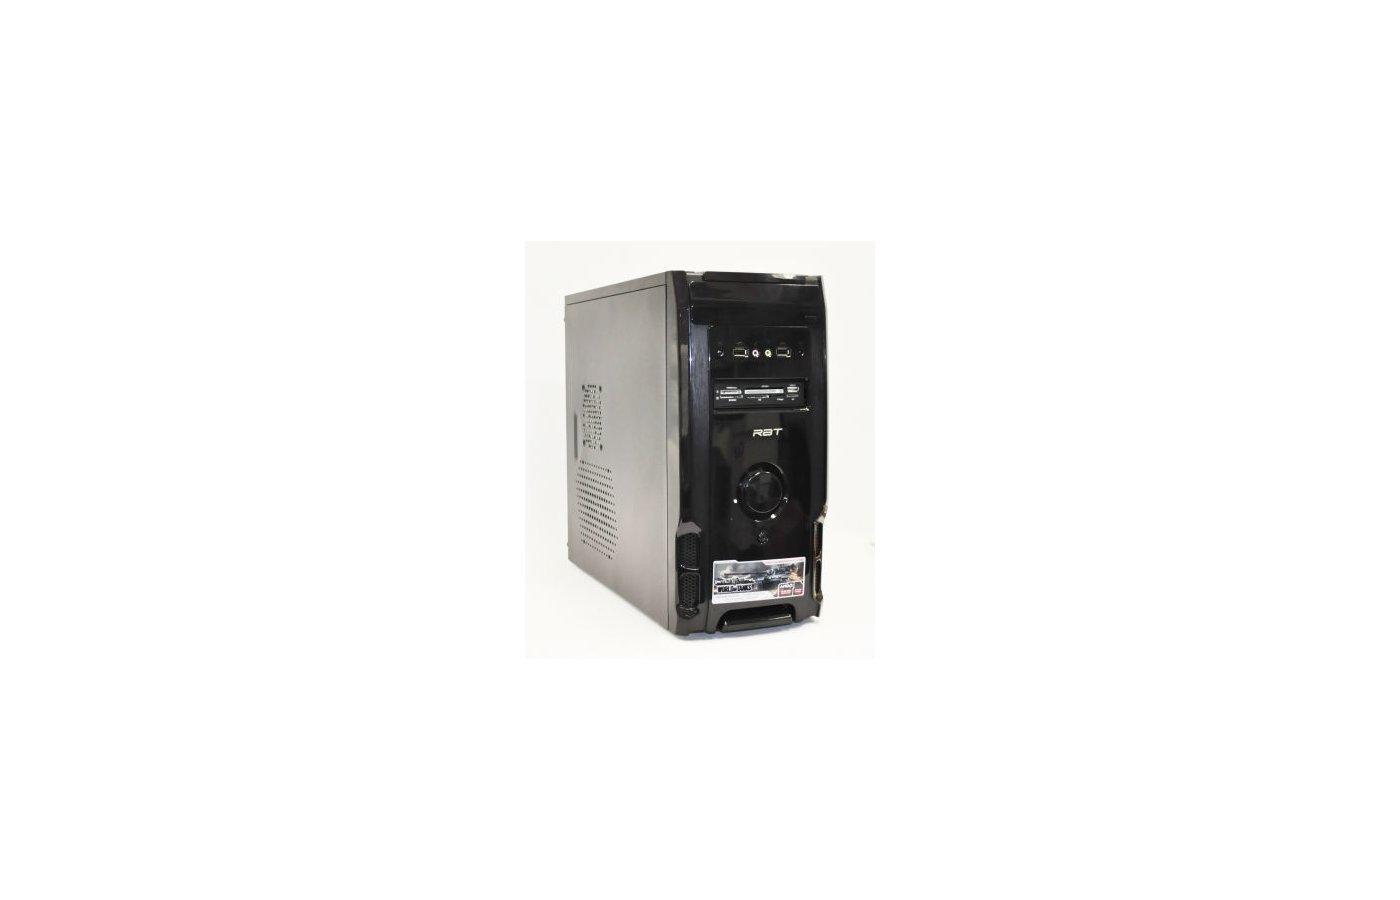 Системный блок РБТ R246 AMD X4 A8 7600 3.1Gh/4Gb/500Gb/R7 240D/DVD-RW/CR/DOS